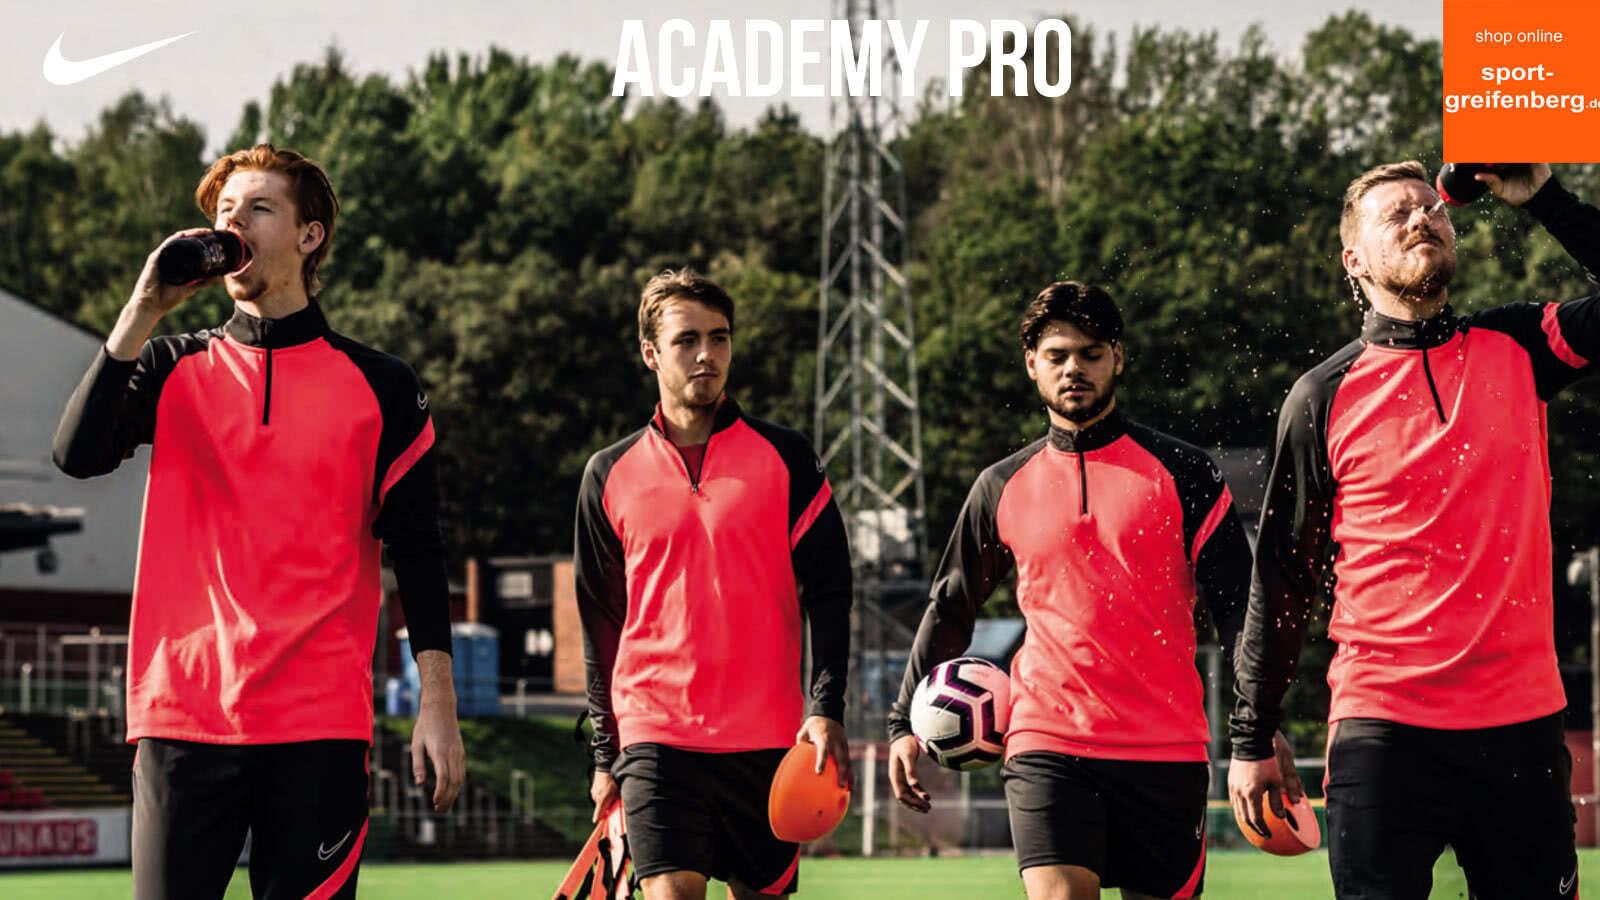 Nike Academy Pro Teamline